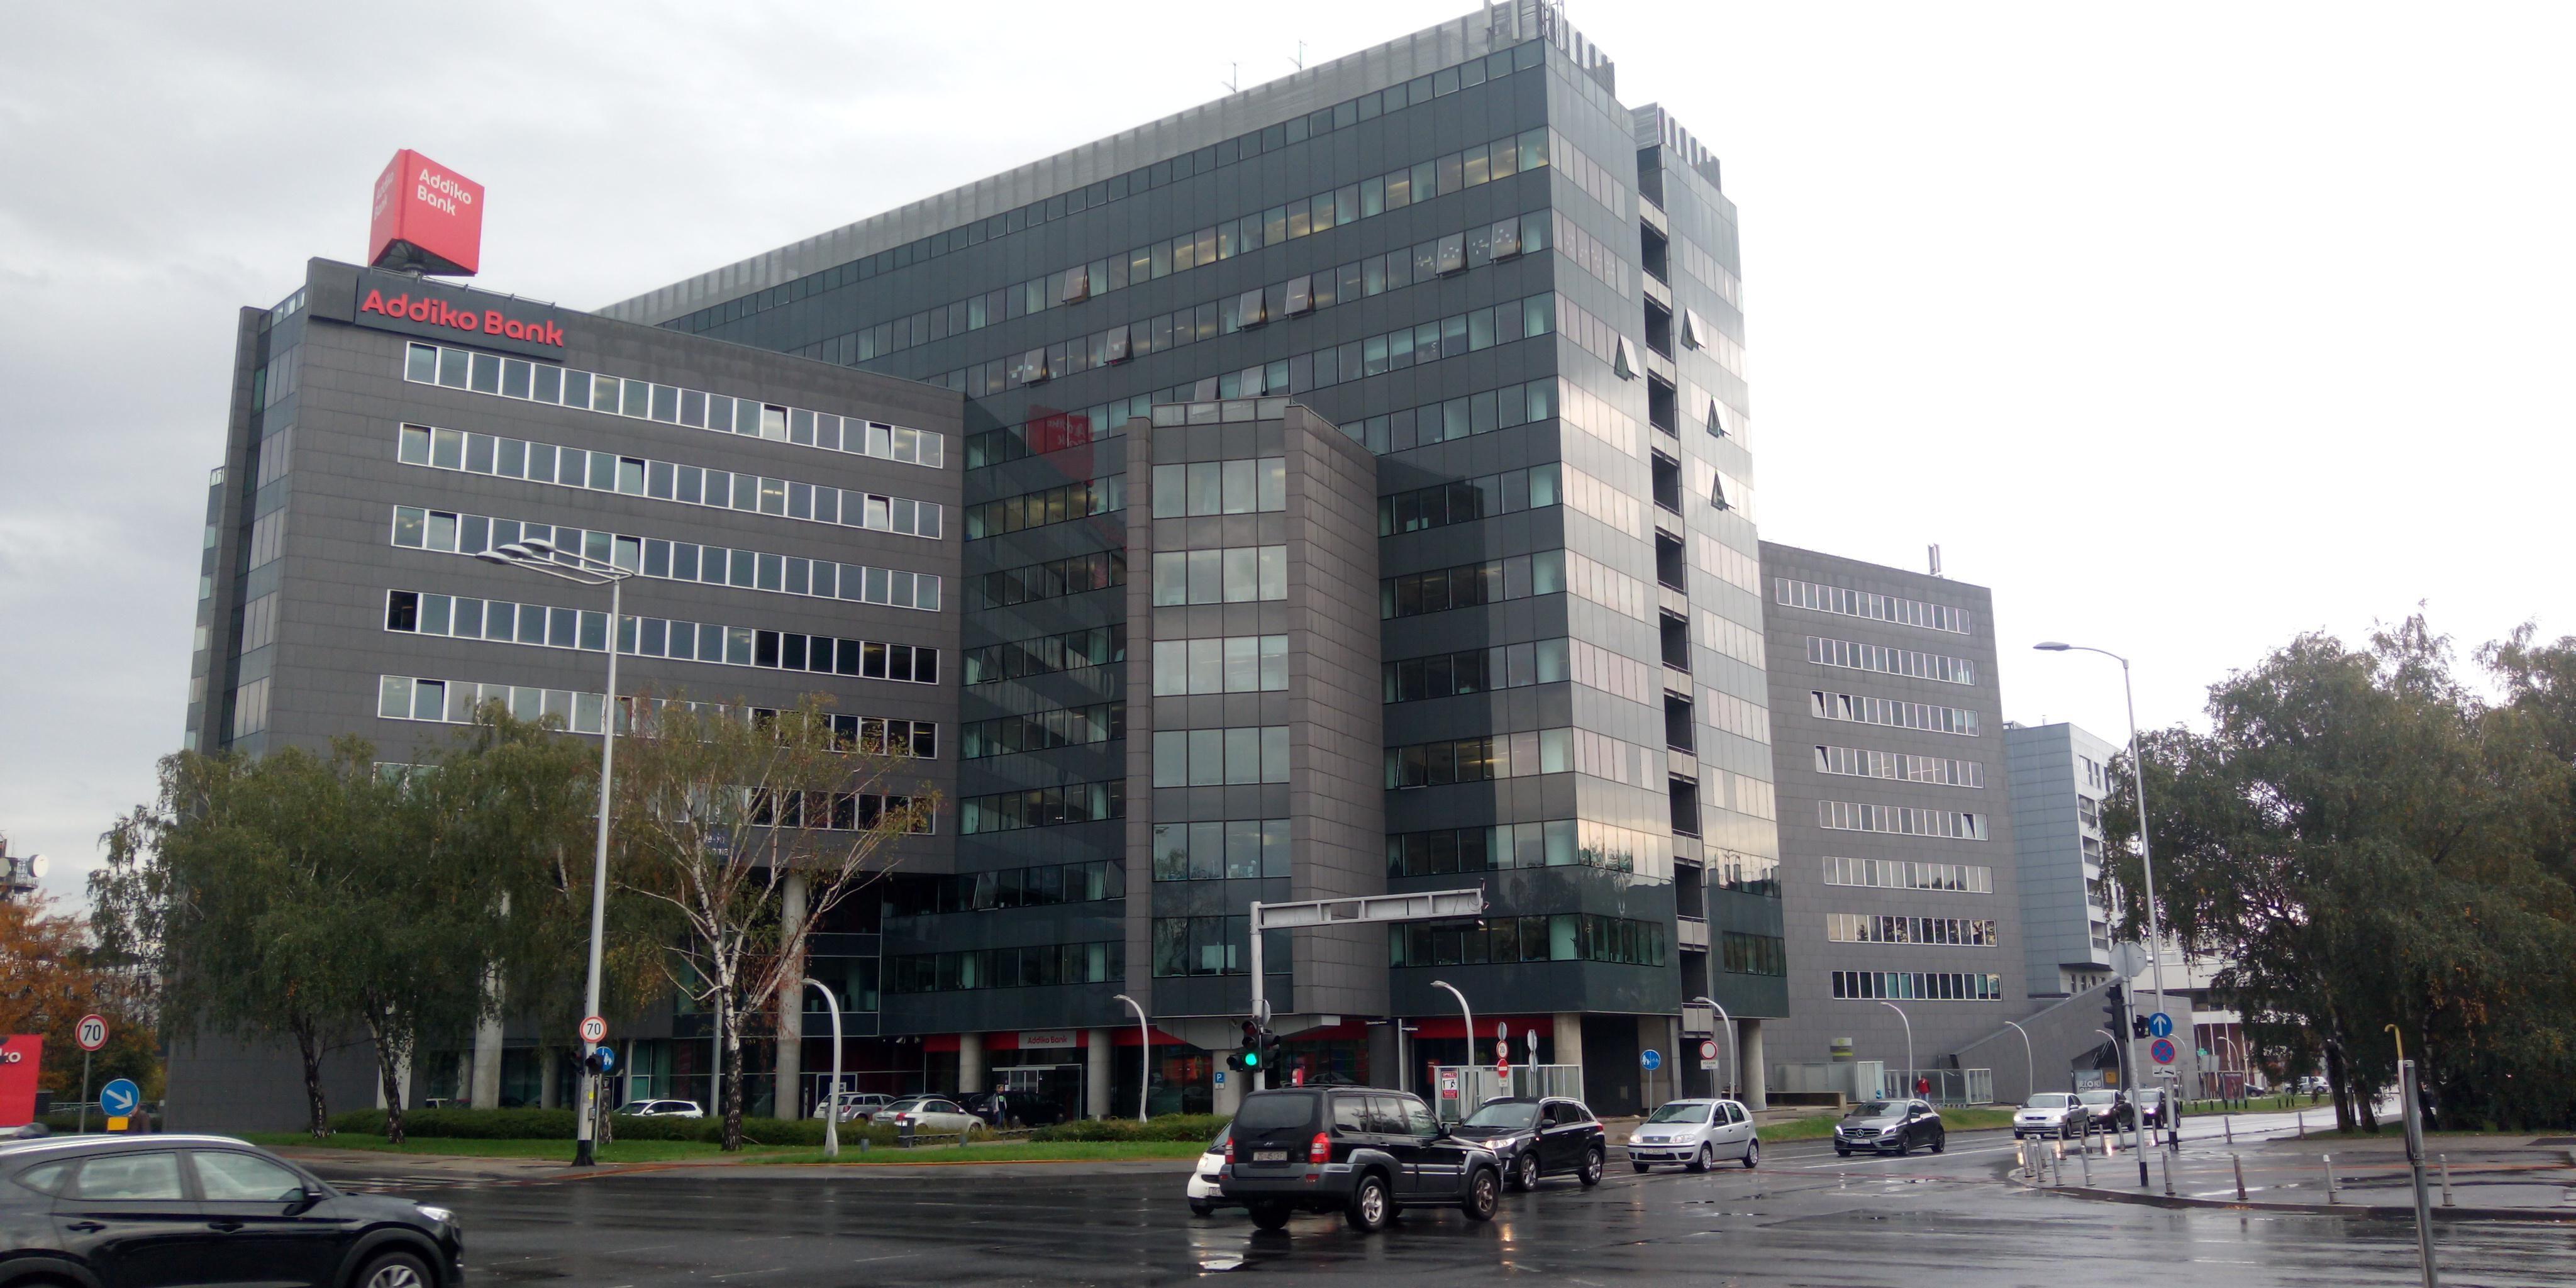 Zagreb Croatia Adikko Bank